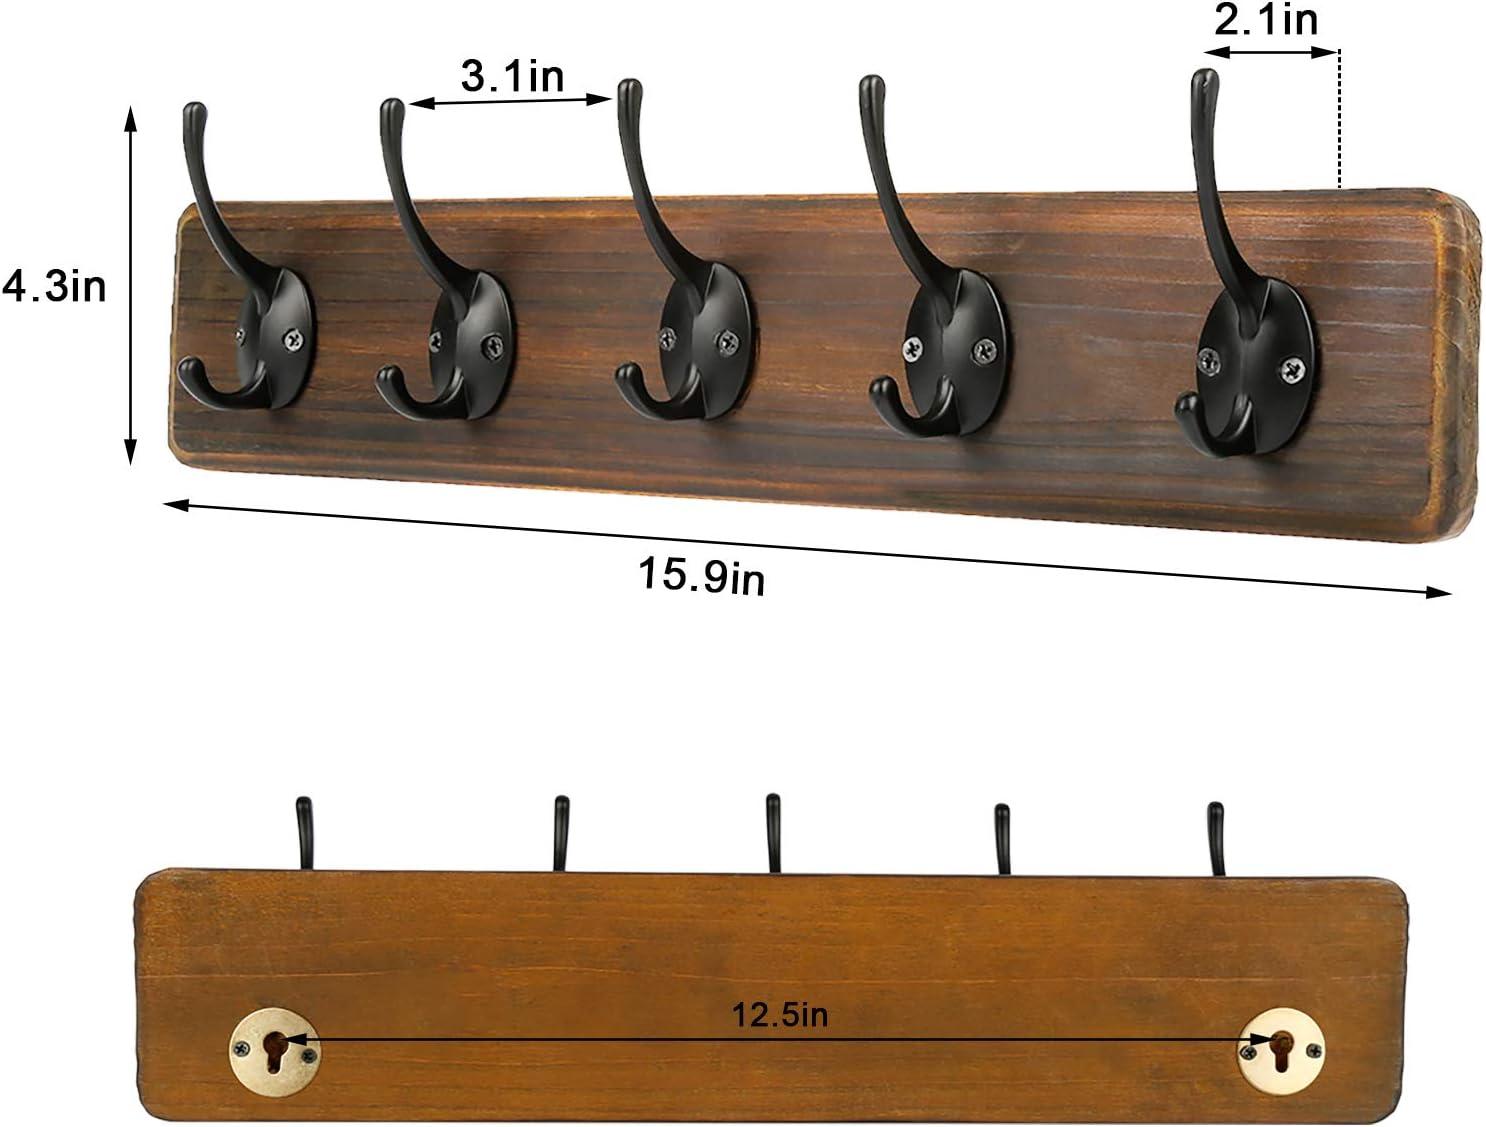 PHINGEER Rustic Wooden Wall Mounted Coat Rack Heavy Duty Hanging Coat Rack with 5 Decorative Hooks for Entryway Mudroom Kitchen Bathroom Living Room Foyer Hallway